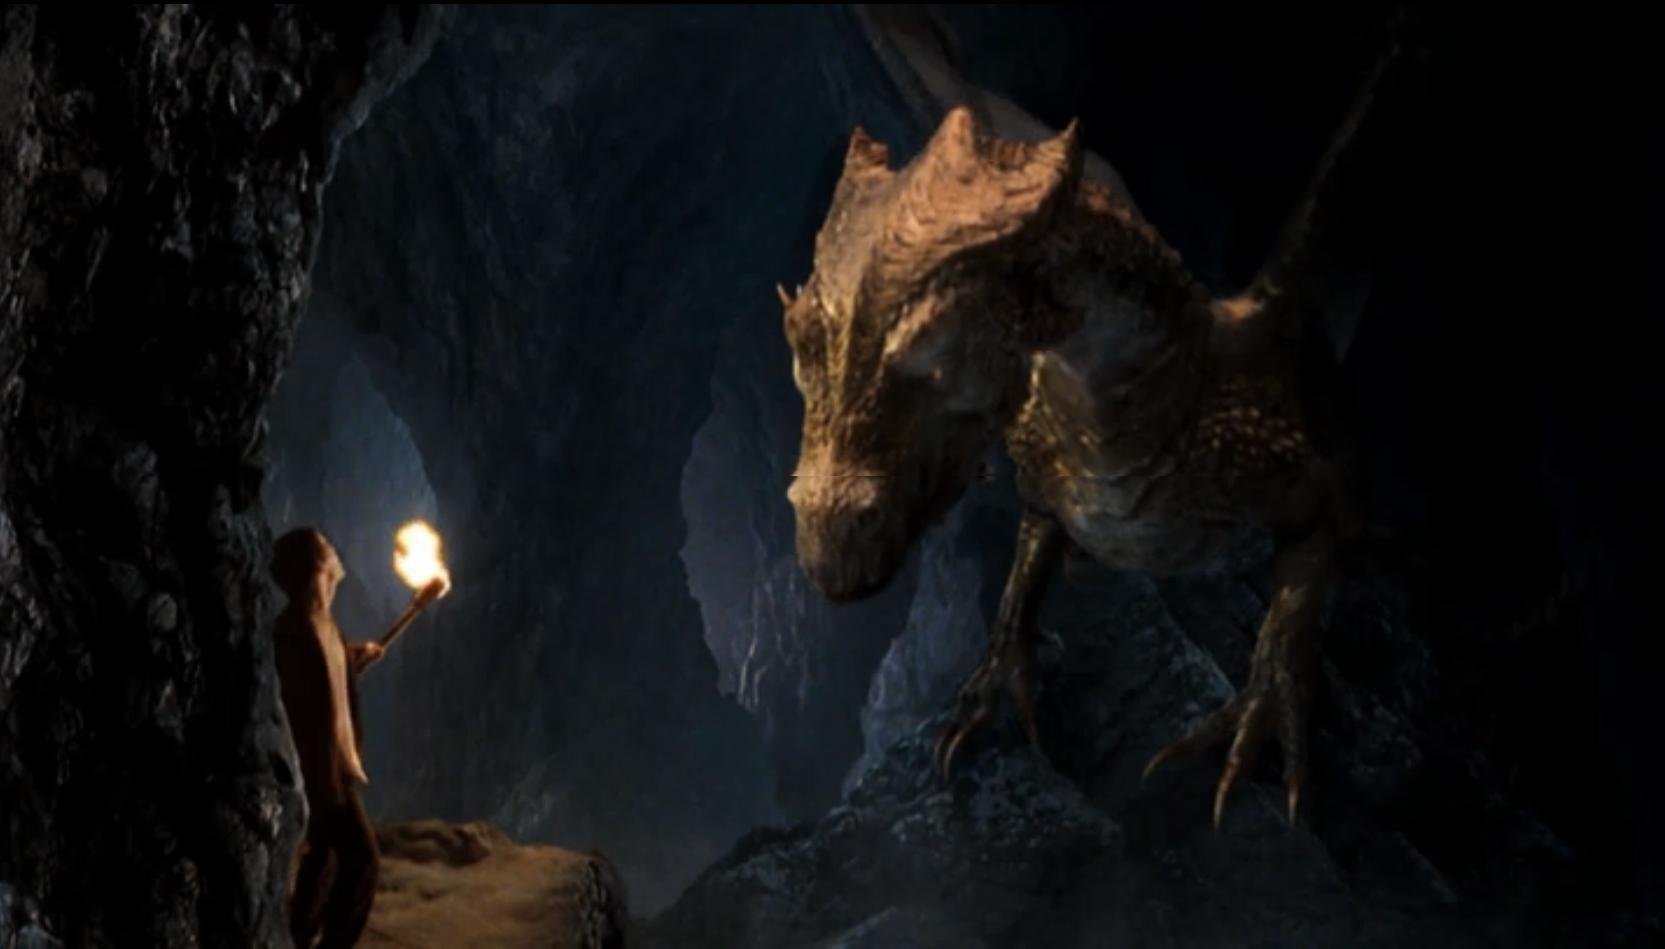 Merlin Dragon: Pilot Rewatch: Merlin